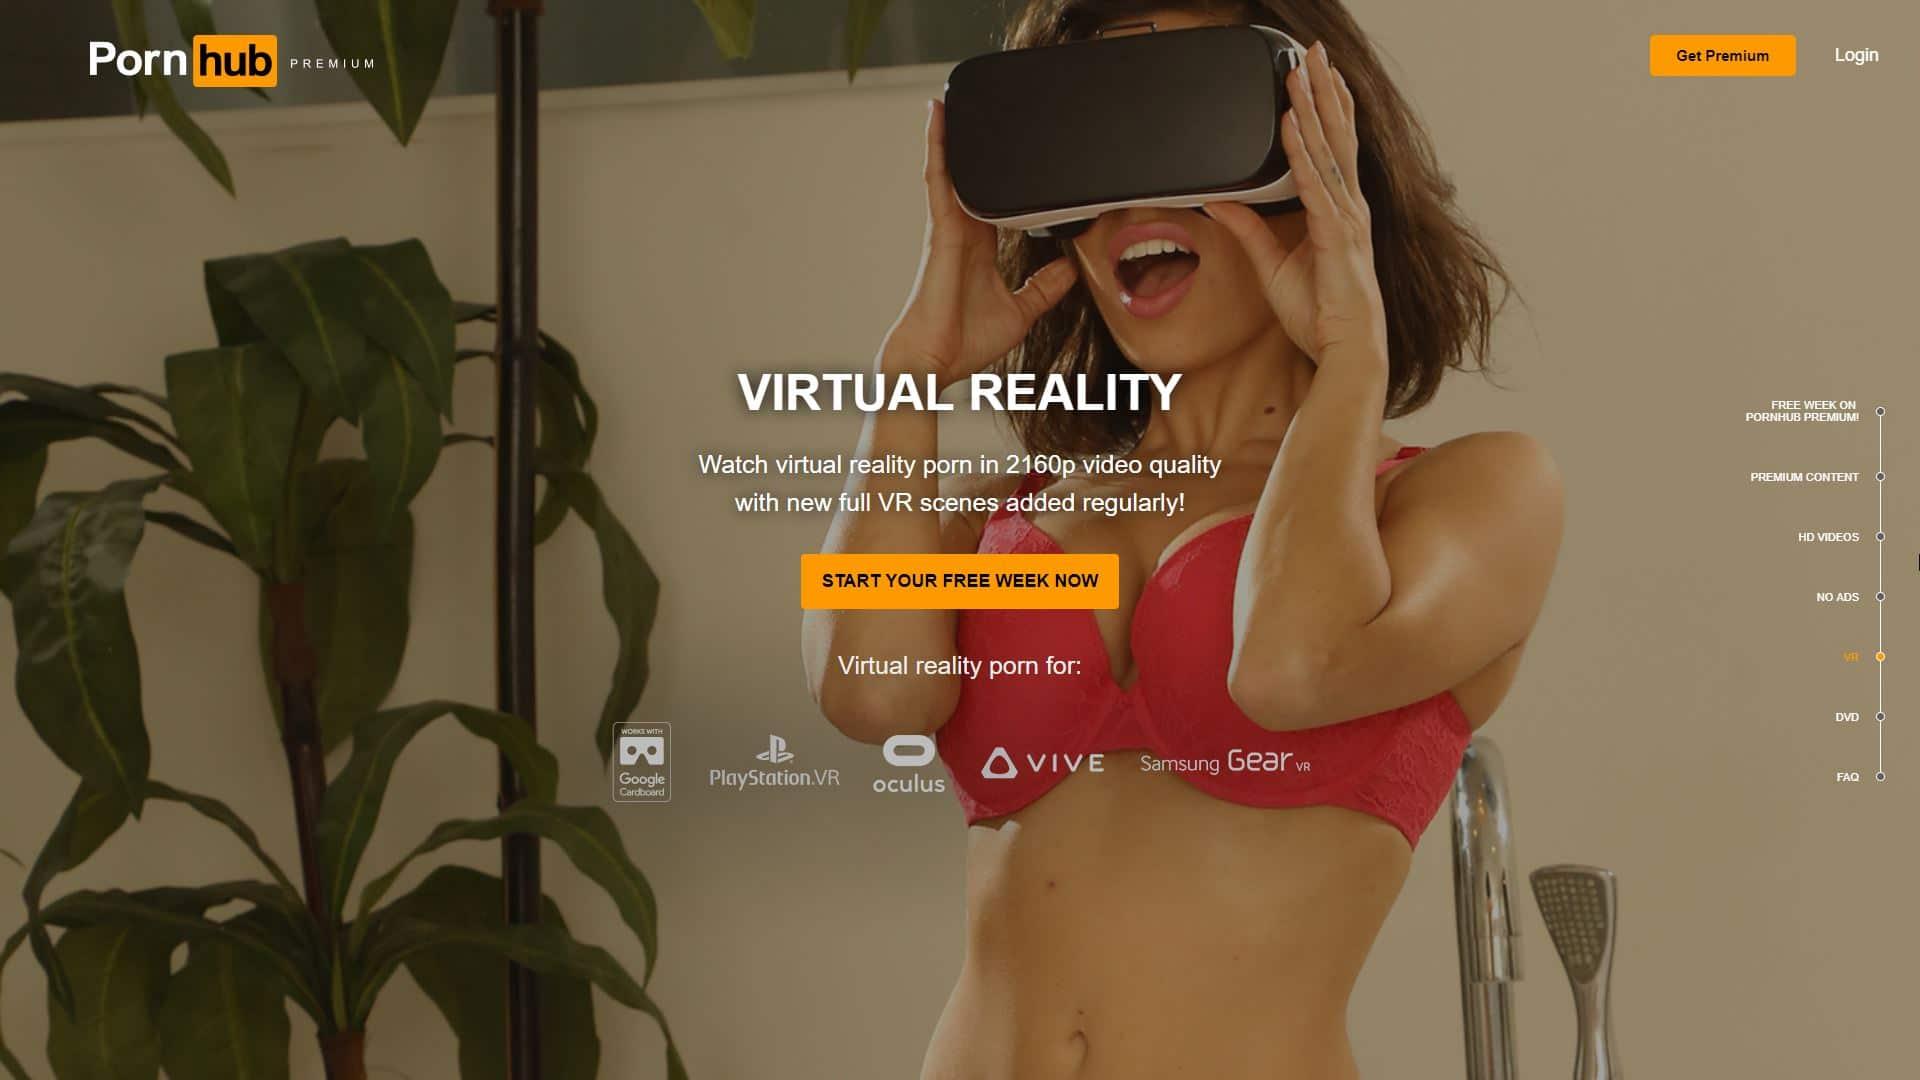 Porn Hub Indian VR